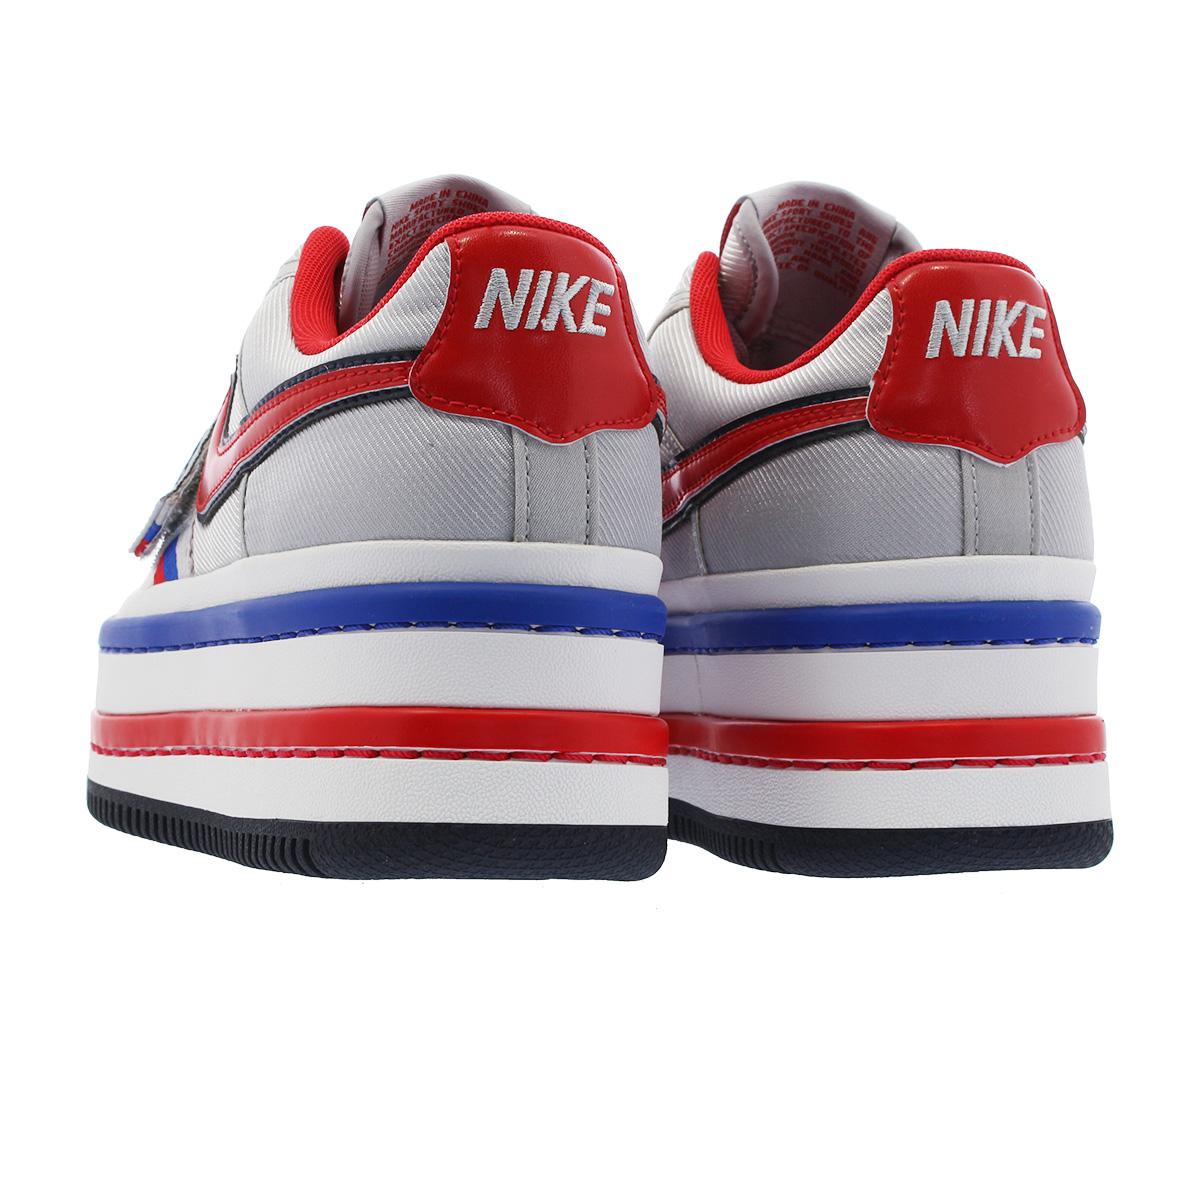 quality design 42be7 4ee9d NIKE WMNS VANDAL 2K Nike women Vandal 2K METALLIC SILVERUNIVERSITY RED